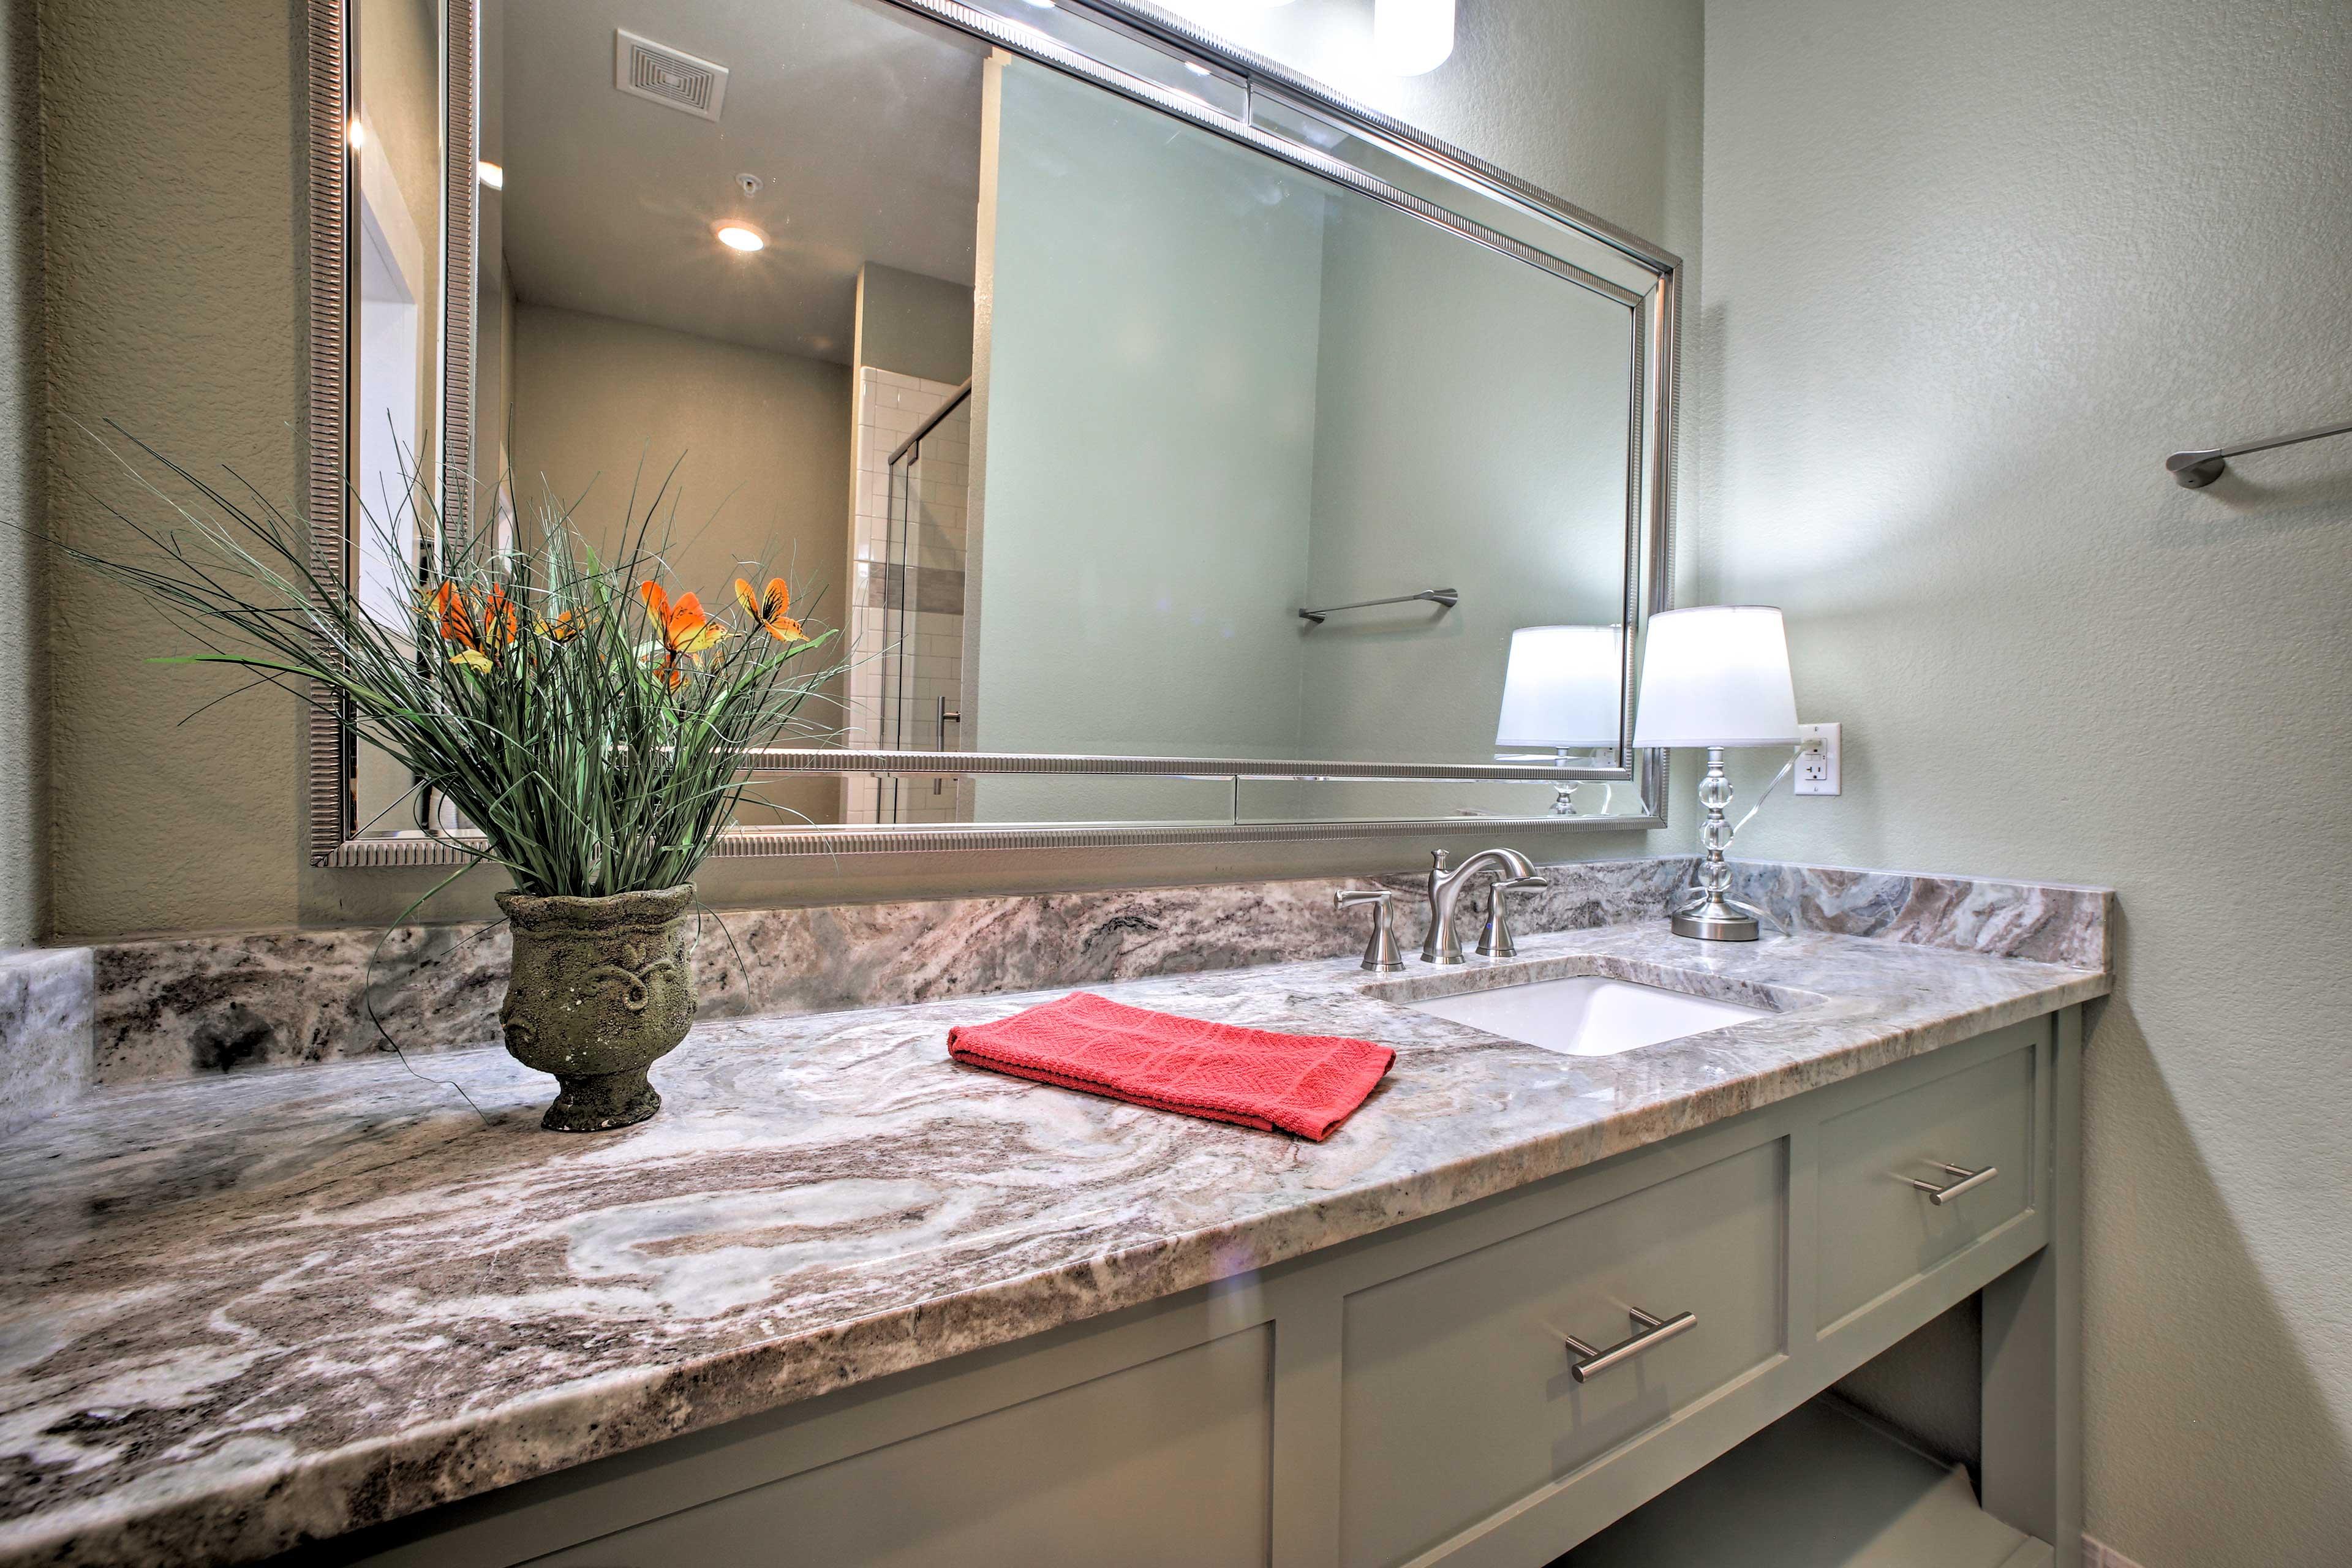 Freshen up in the bathroom!